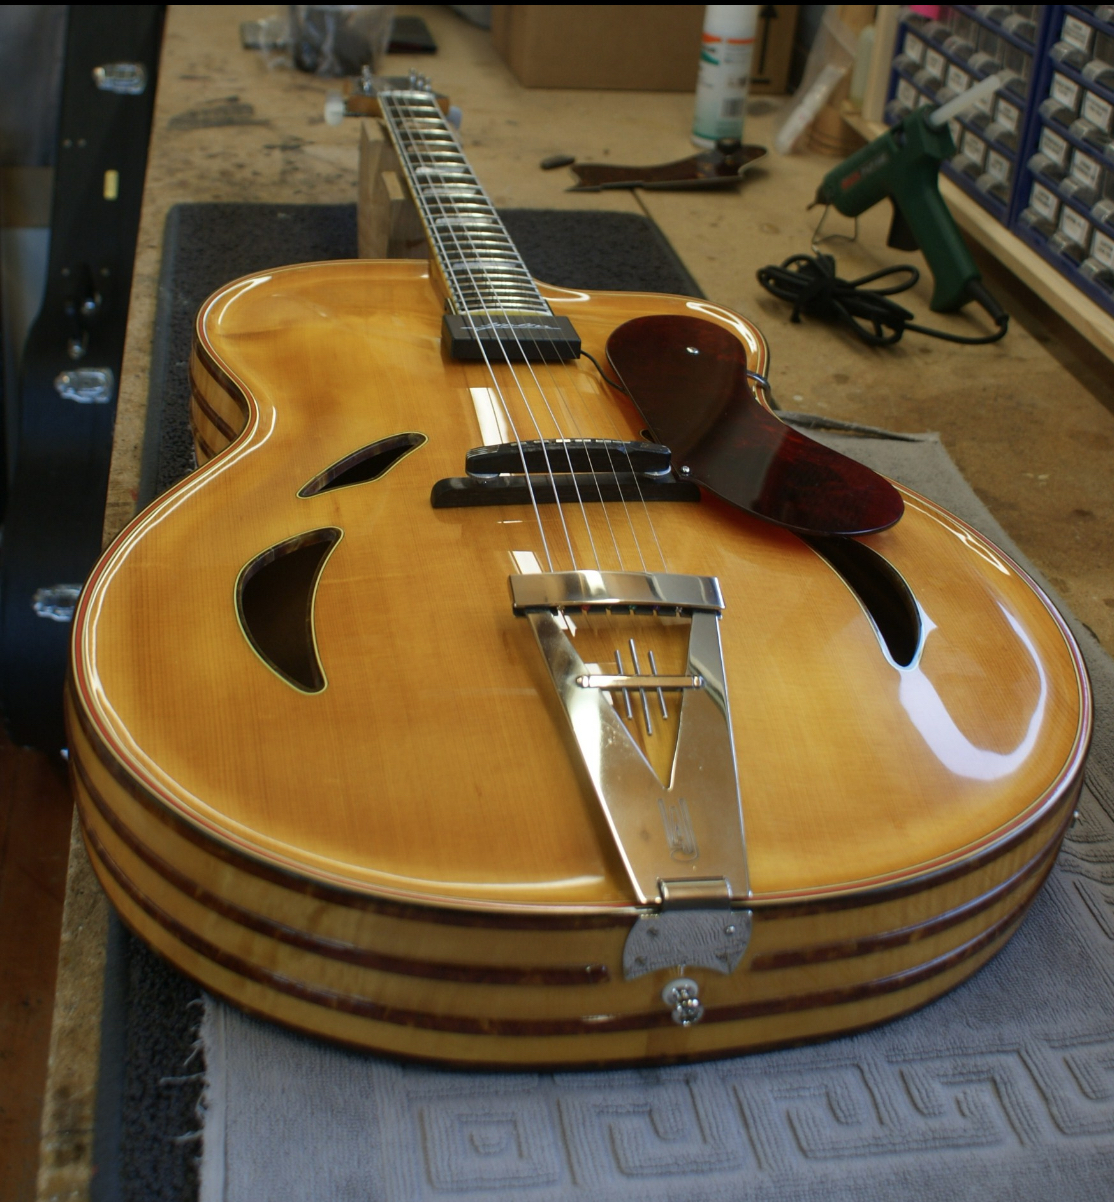 Tradition in guitar building/design-lang-zoller-1-jpg